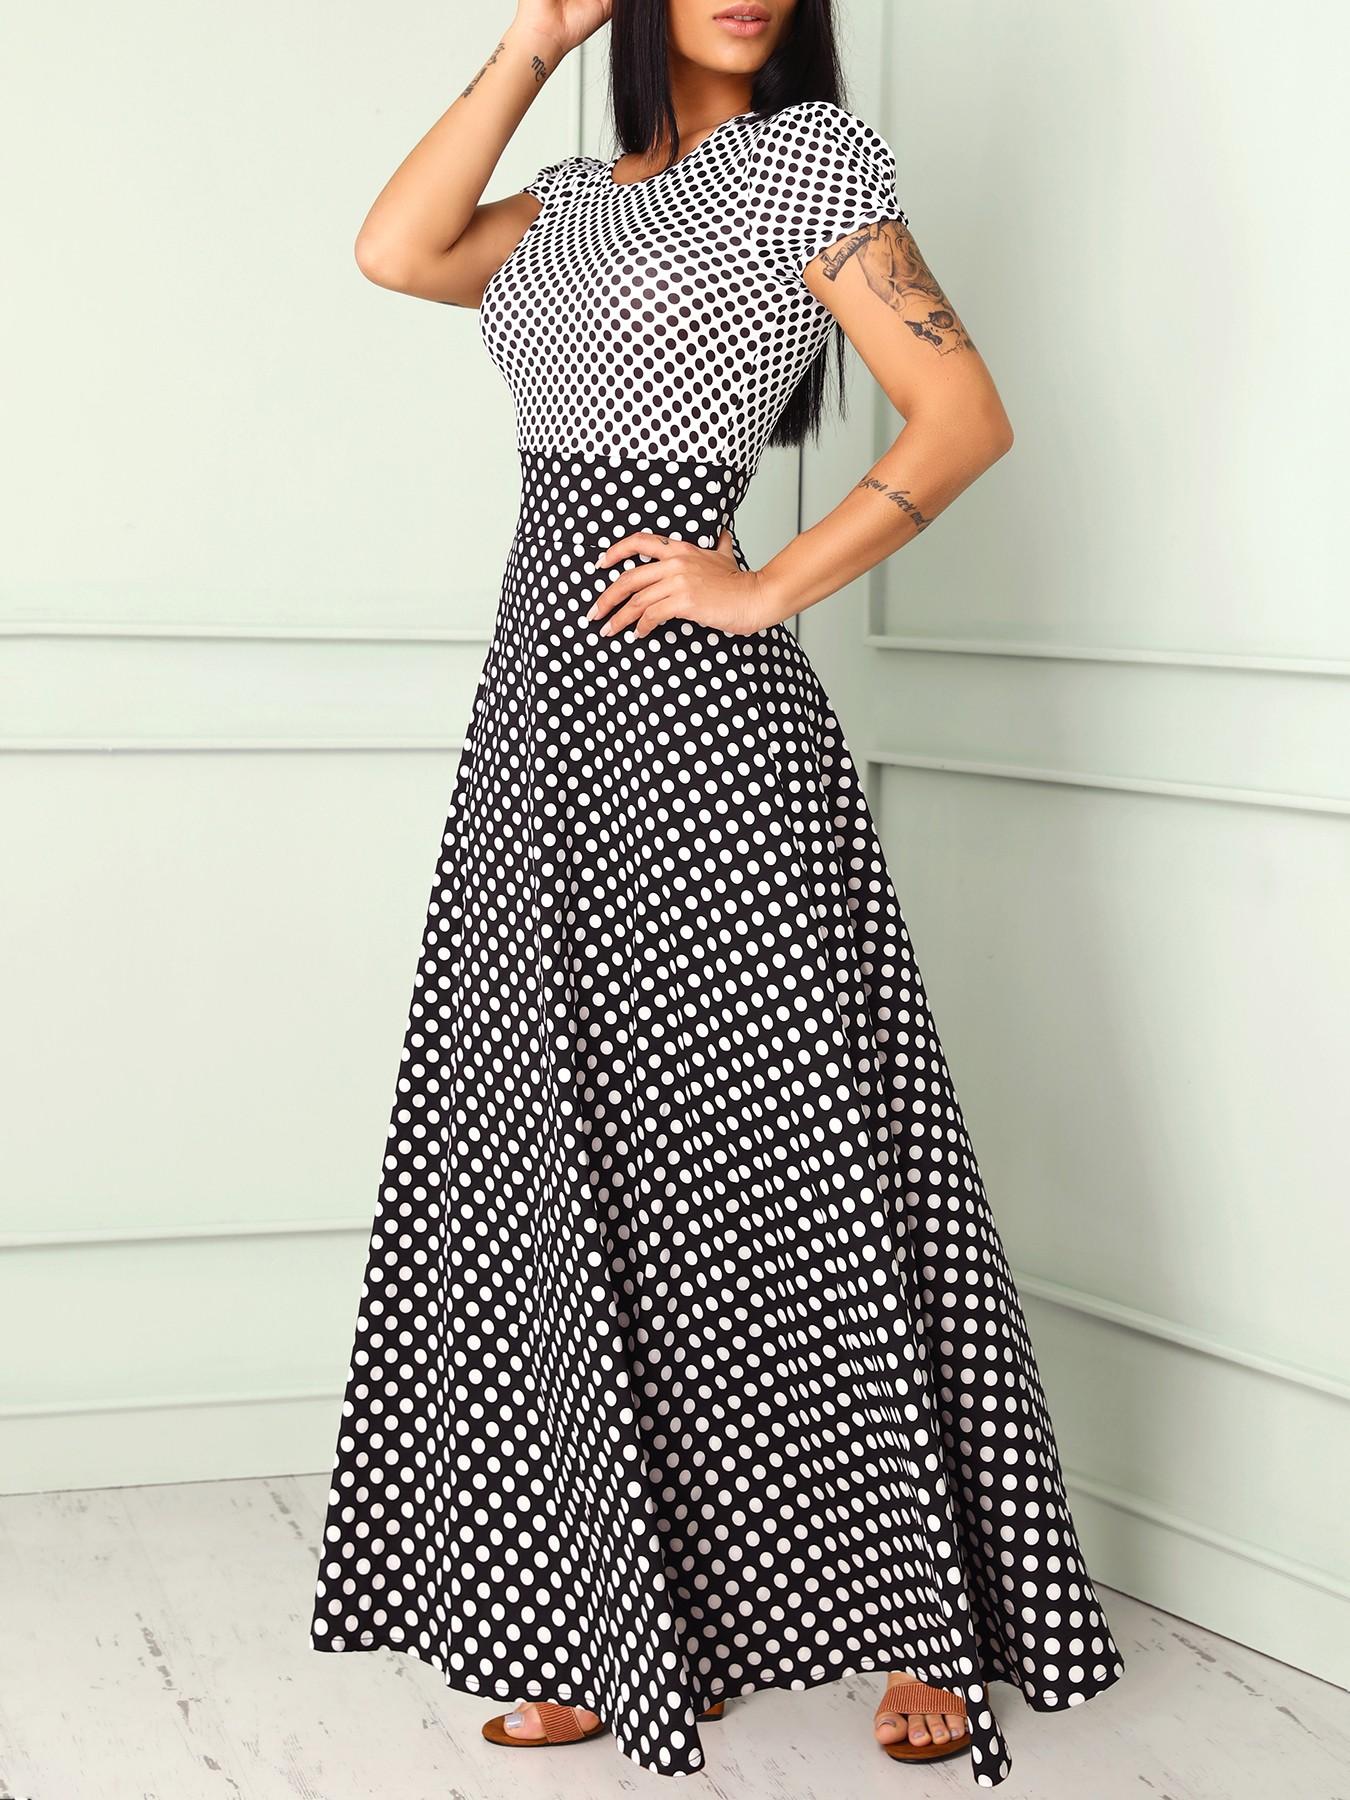 boutiquefeel / Short Sleeve Polka Dots Print Patchwork Maxi Dress